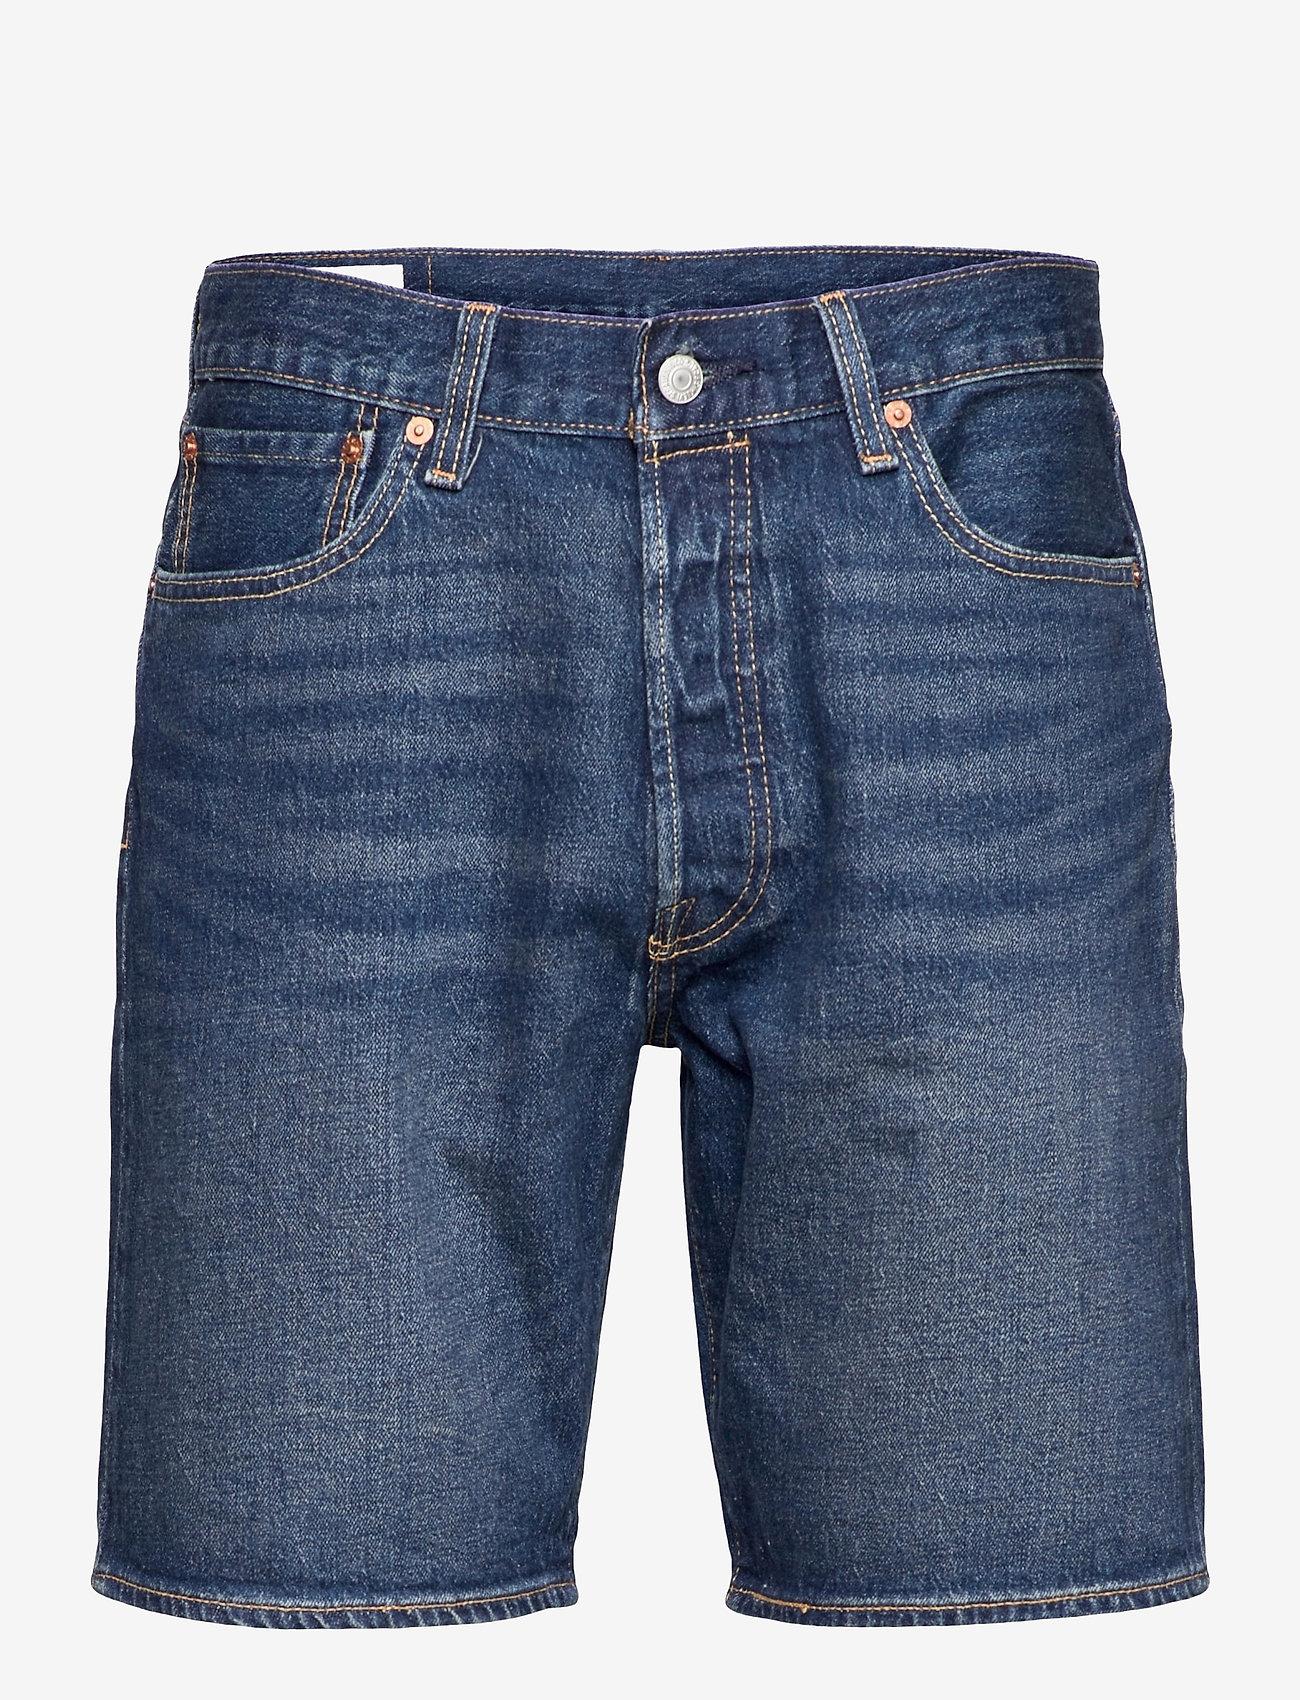 LEVI´S Men - 501 HEMMED SHORT FIRE GOIN SHO - jeansowe szorty - med indigo - flat finish - 0